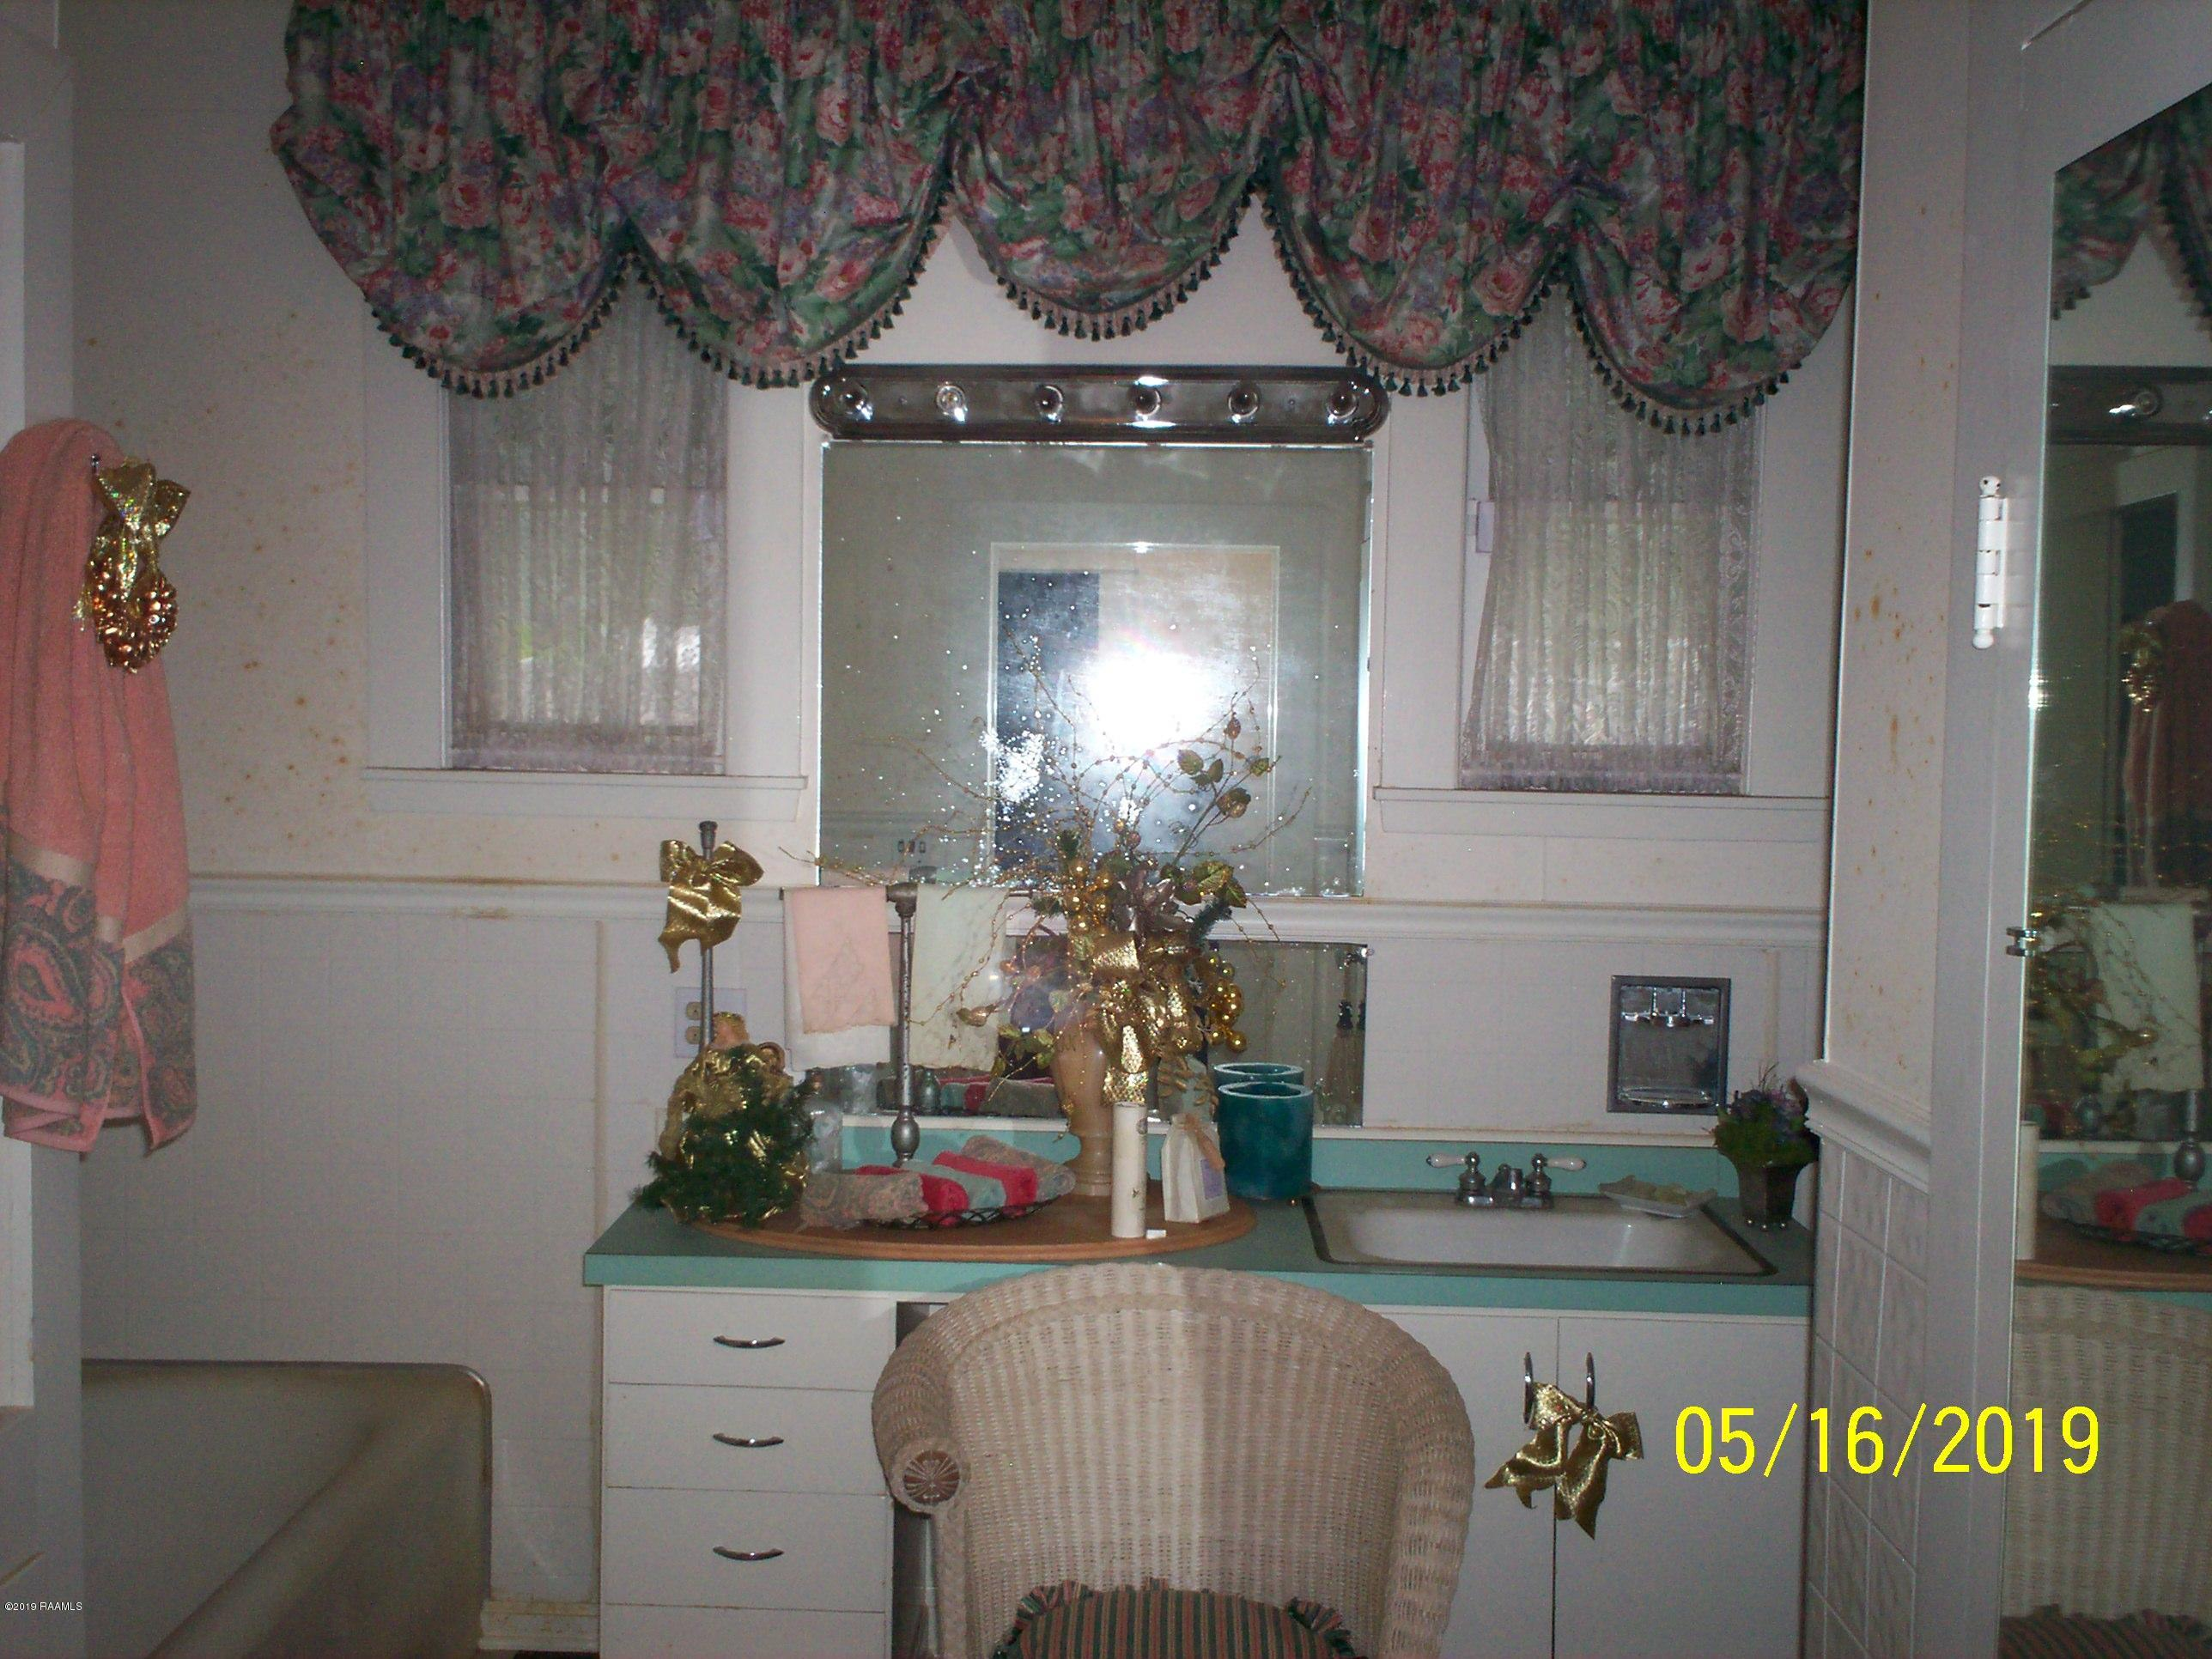 212 Washington Street, St. Martinville, LA 70582 Photo #6